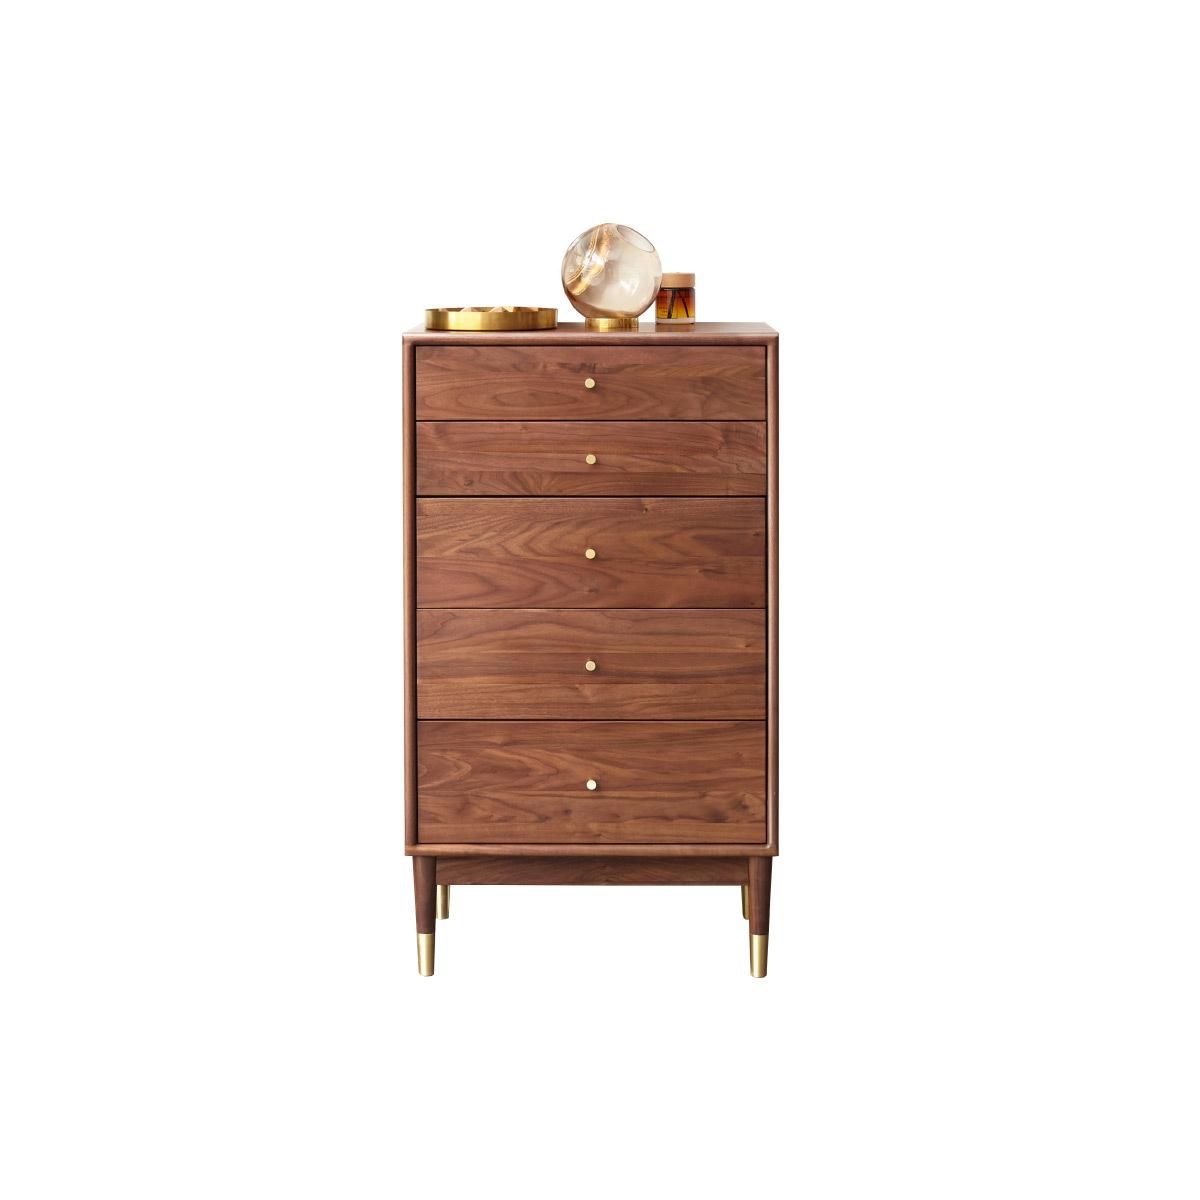 Goethe 5 Drawer Dresser